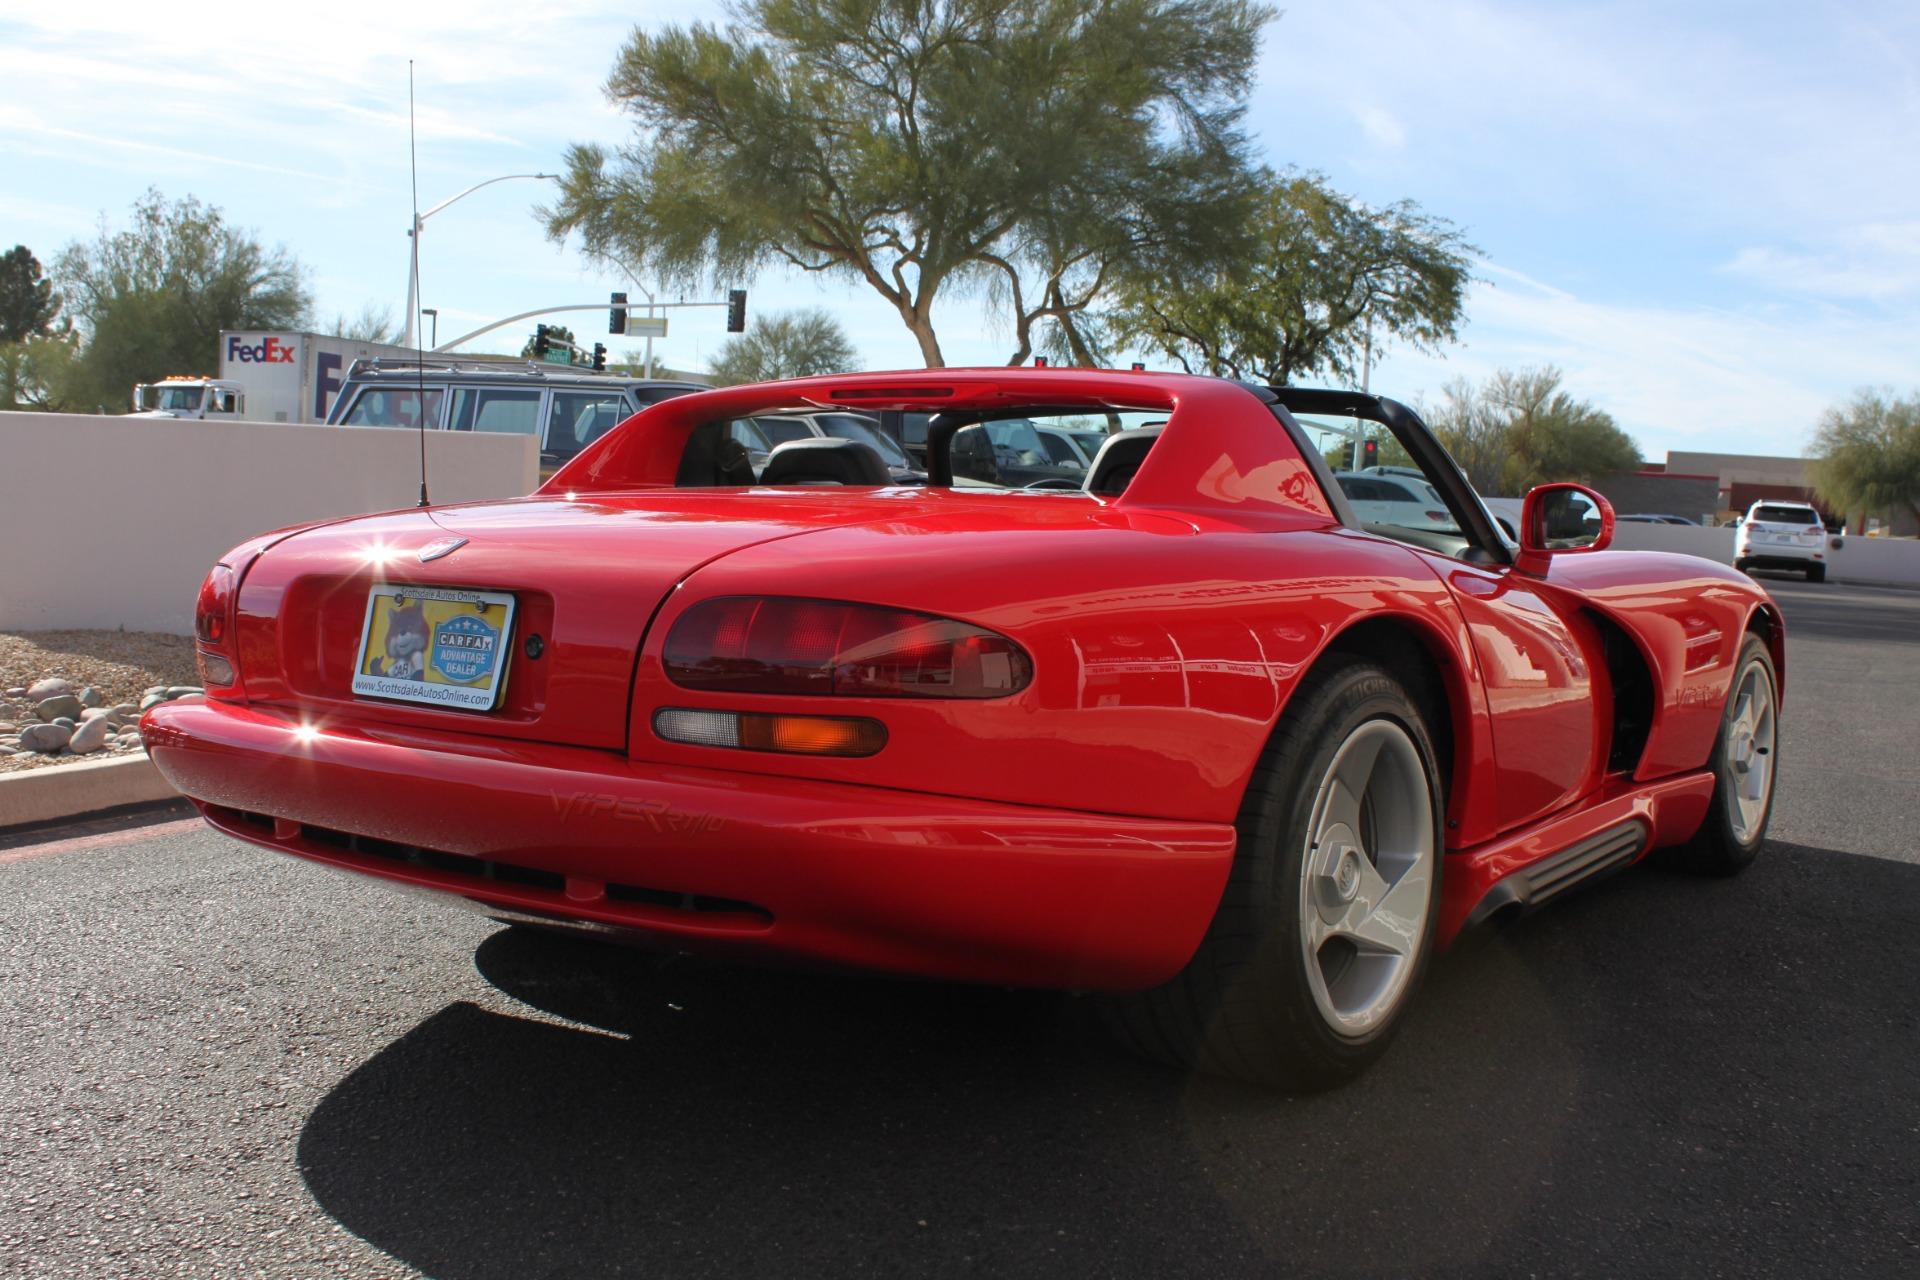 Used-1993-Dodge-Viper-Sports-Car-Classic